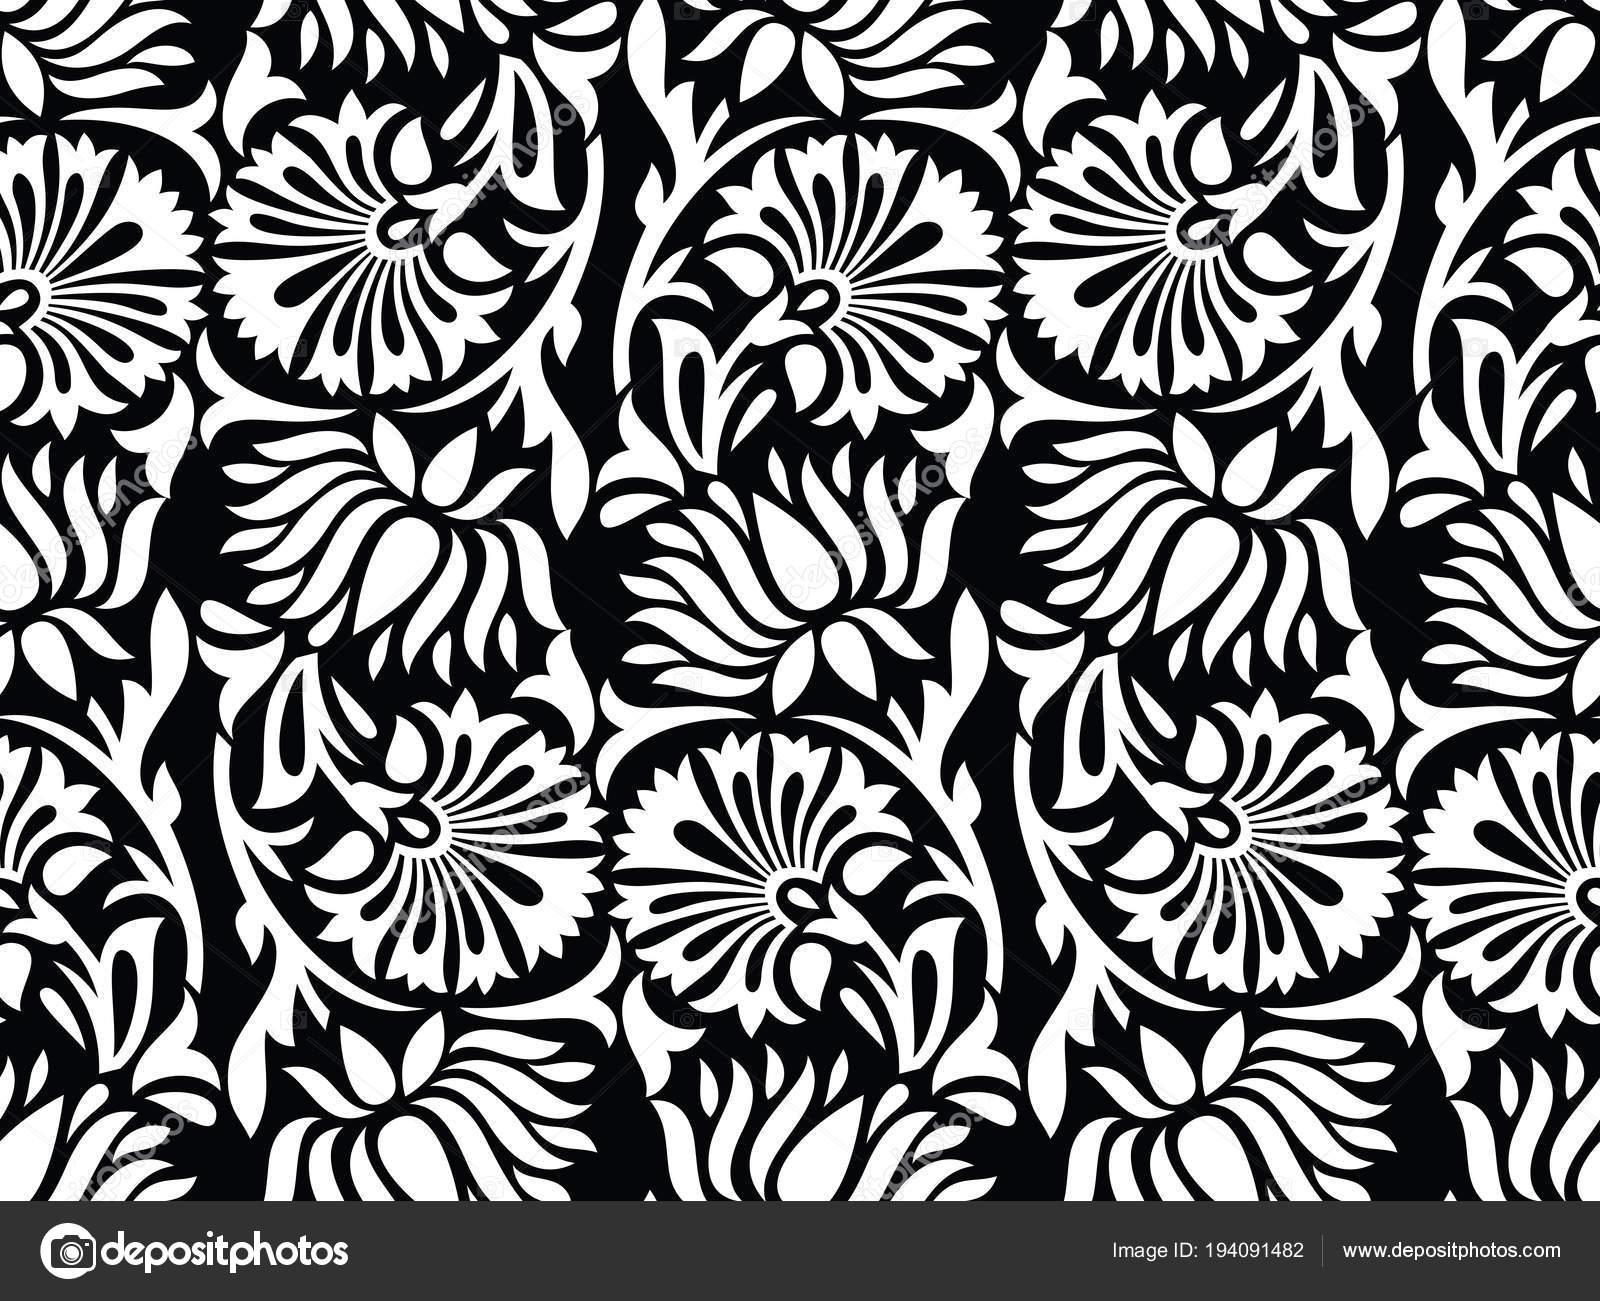 Seamless black and white ornamental lotus flower pattern stock seamless black and white ornamental lotus flower pattern stock vector izmirmasajfo